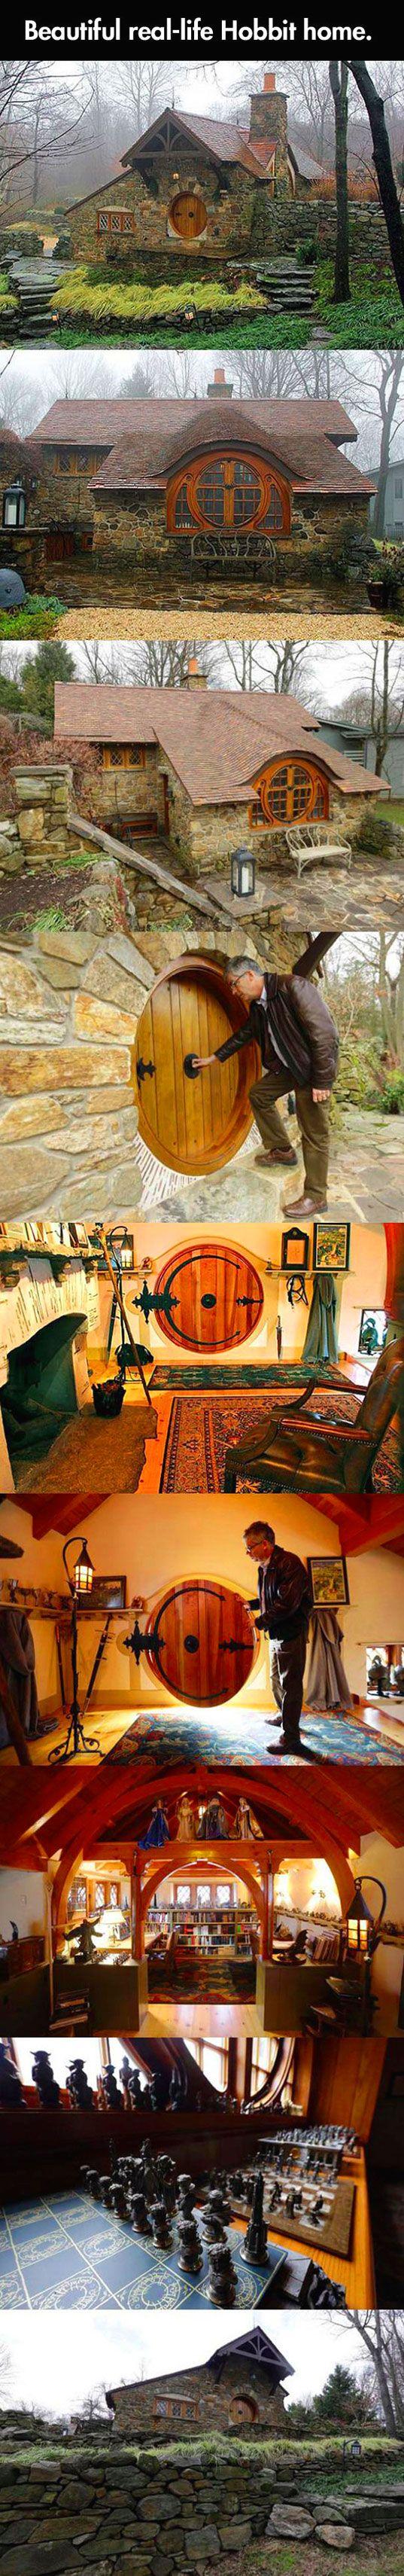 Real-life Hobbit Home.